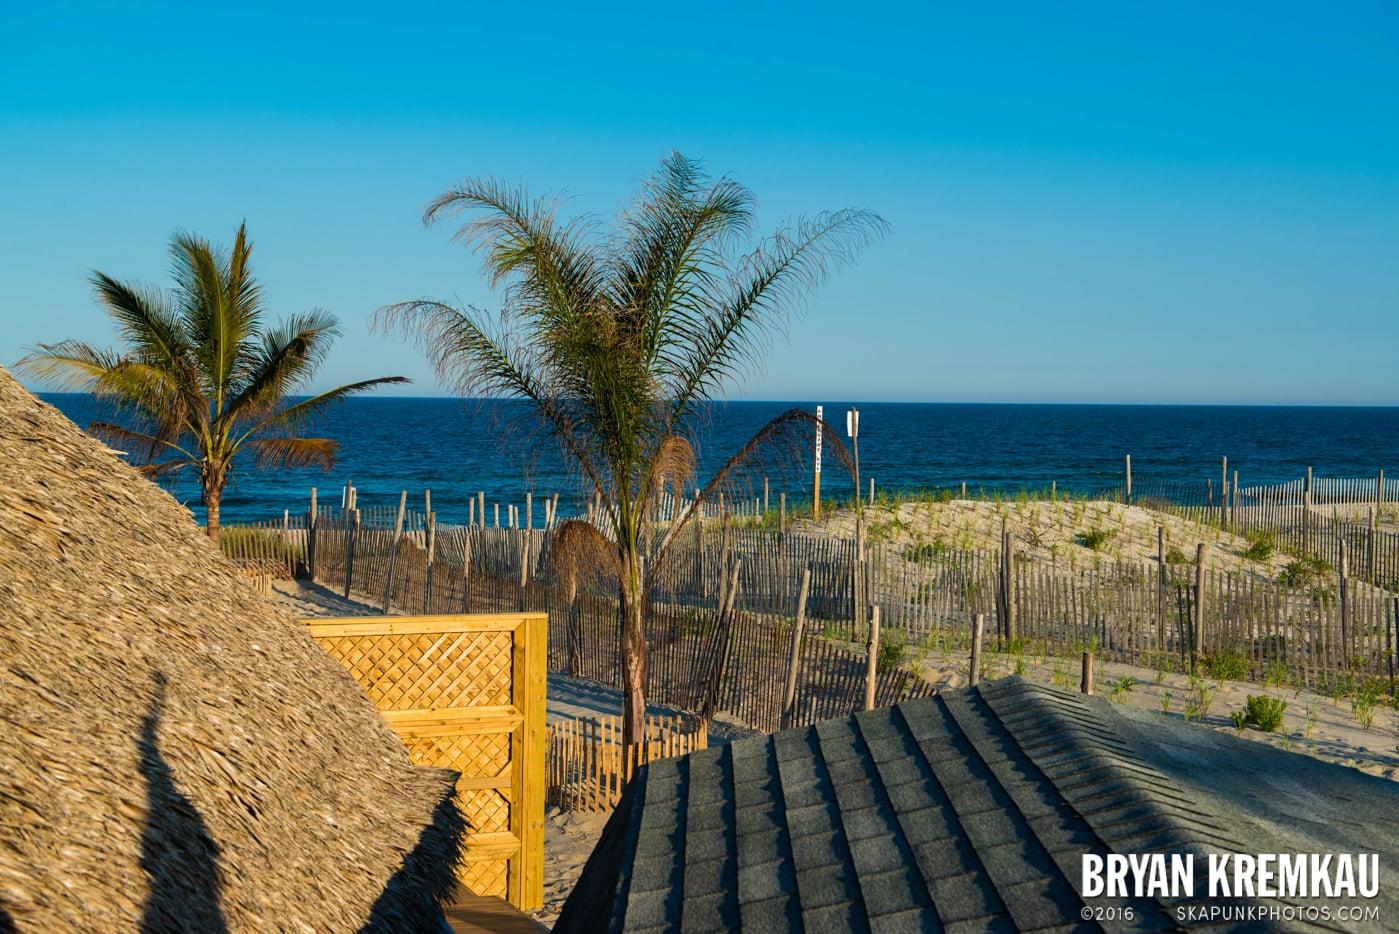 Beach Haven Long Island Nj 6 16 14 18